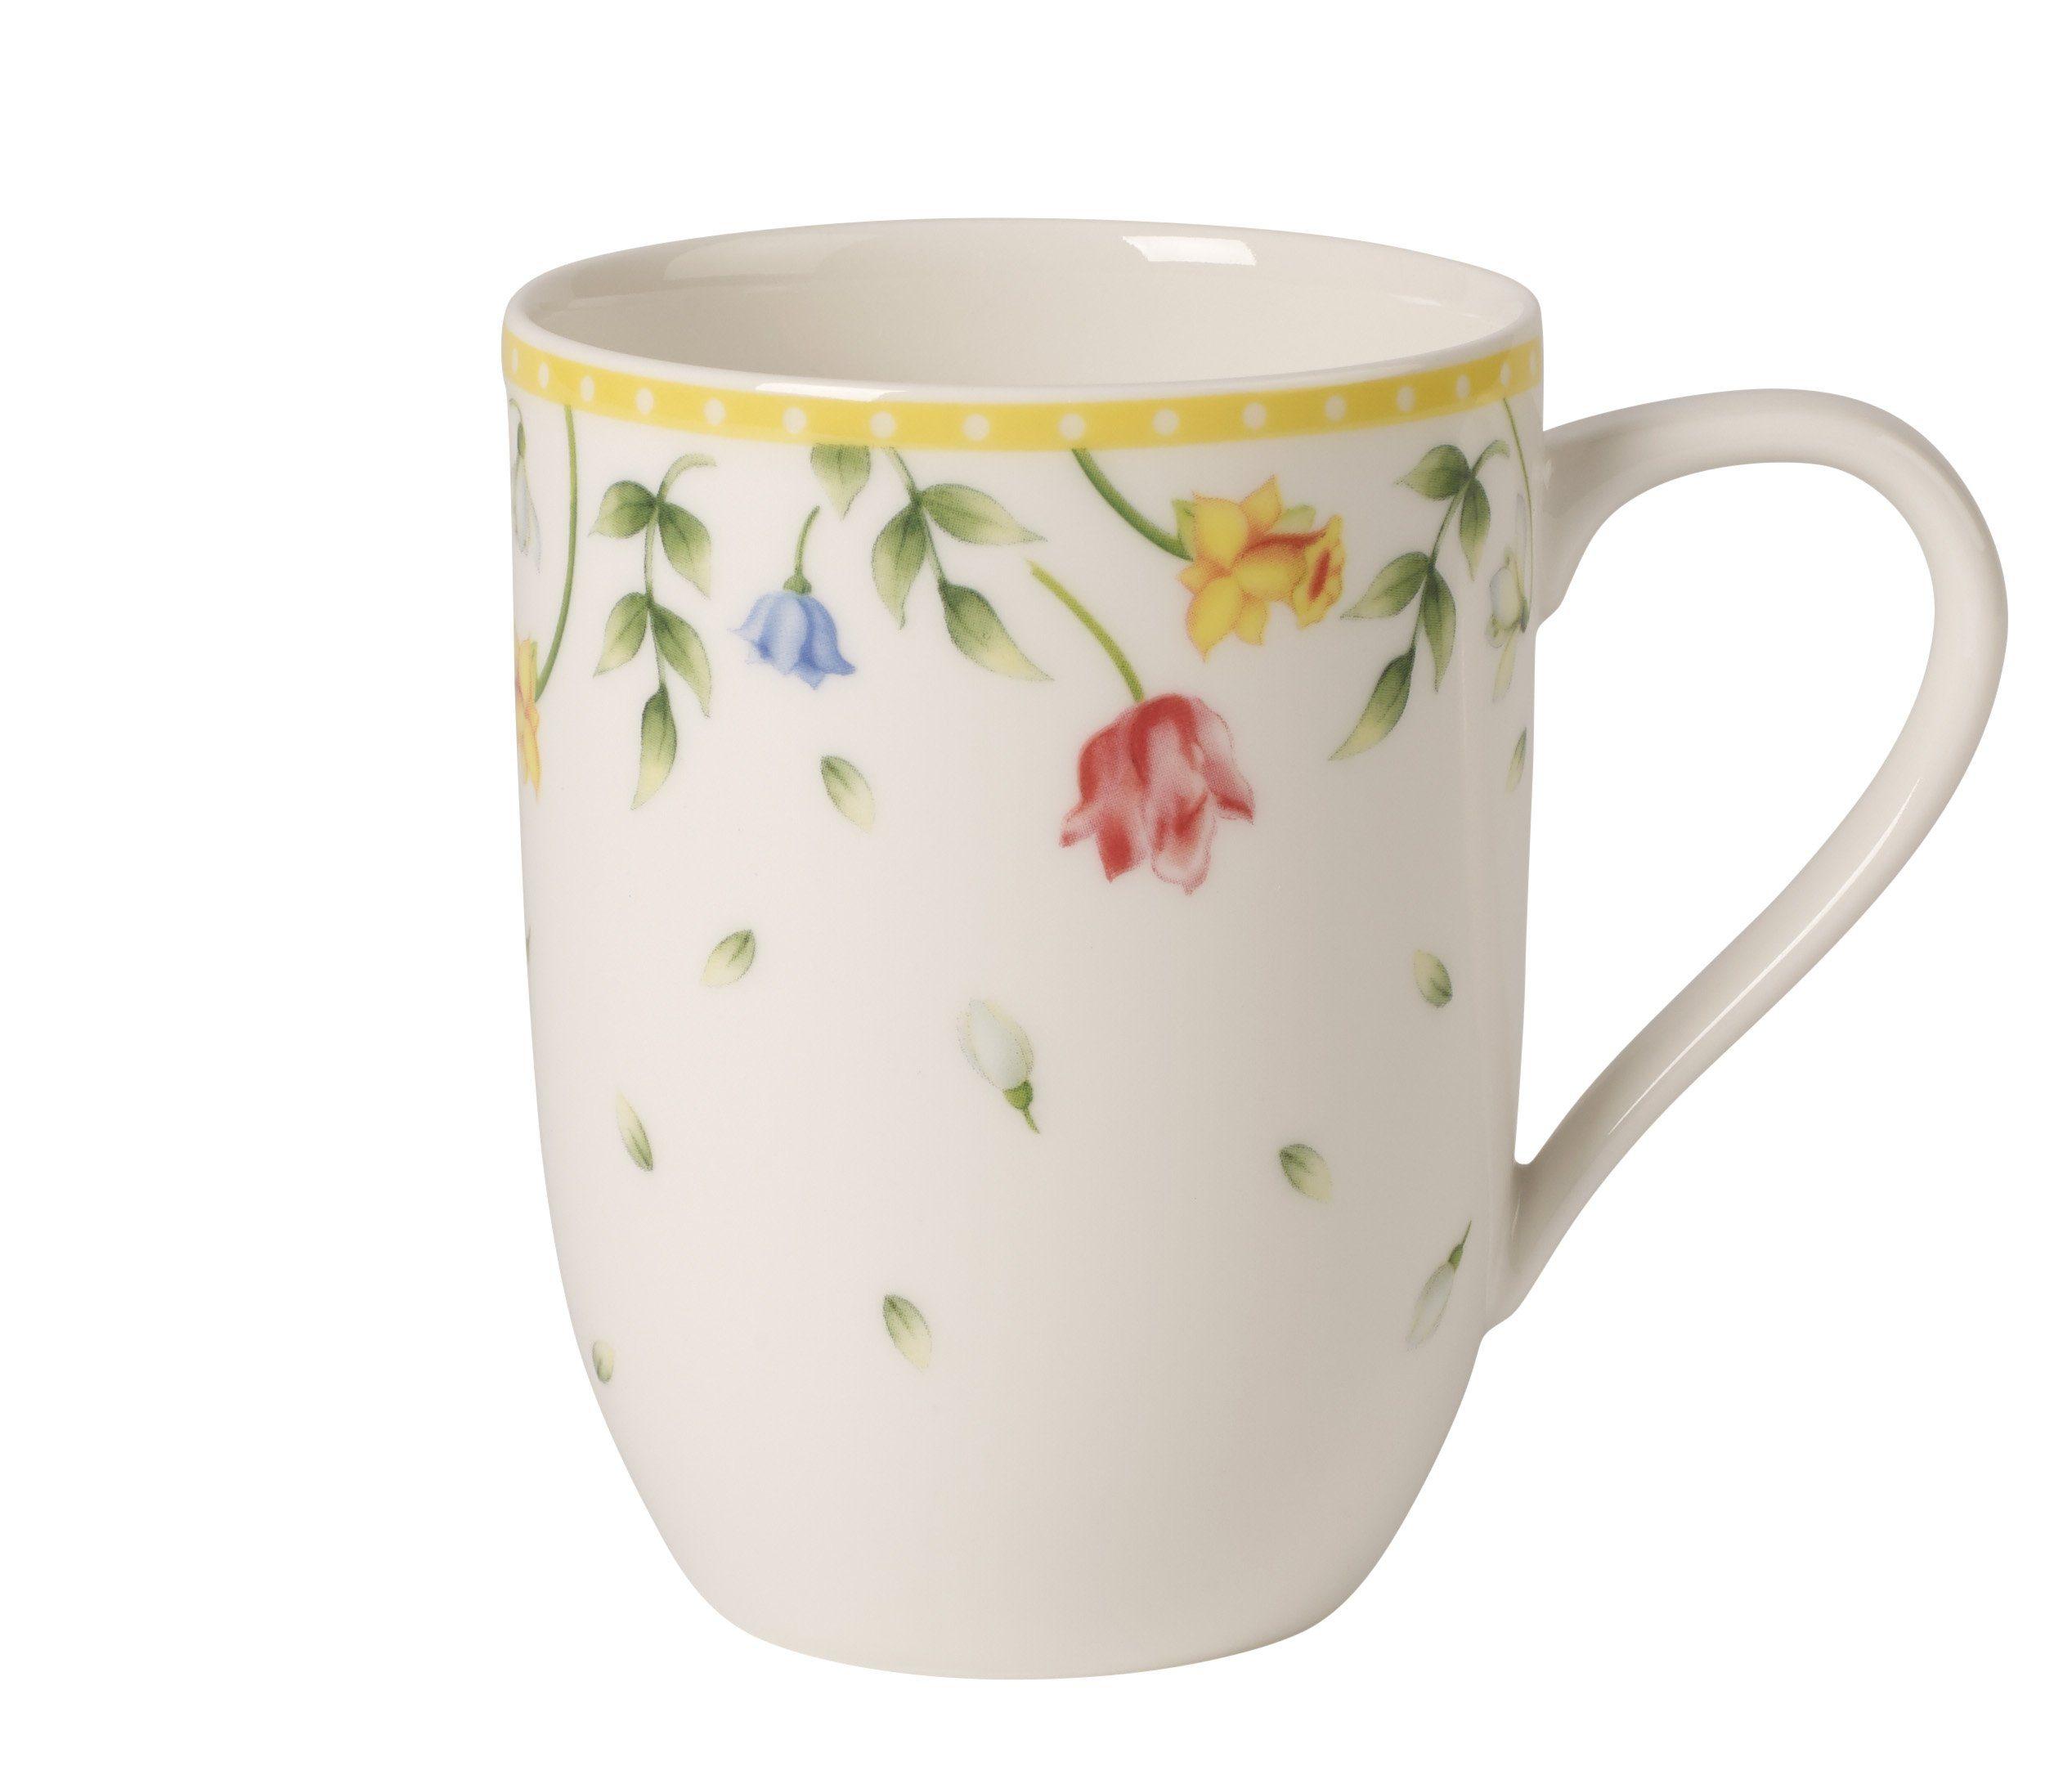 Villeroy & Boch Kaffeebecher Blumenwiese »Spring Awakening«